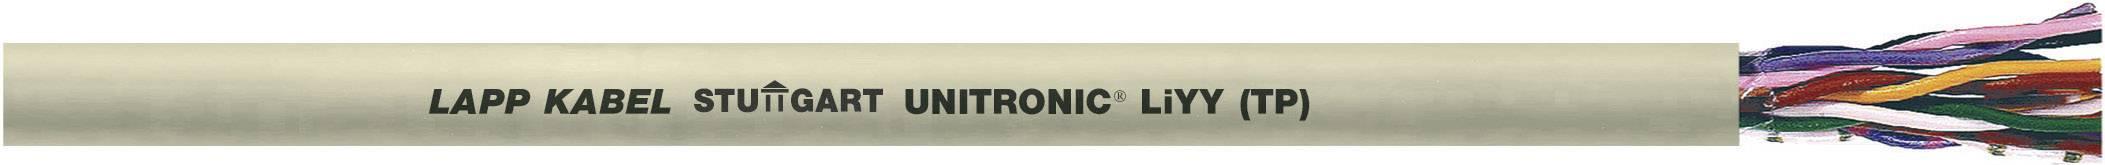 Datový kabel UNITRONIC LIYY TP 2x2x0,14